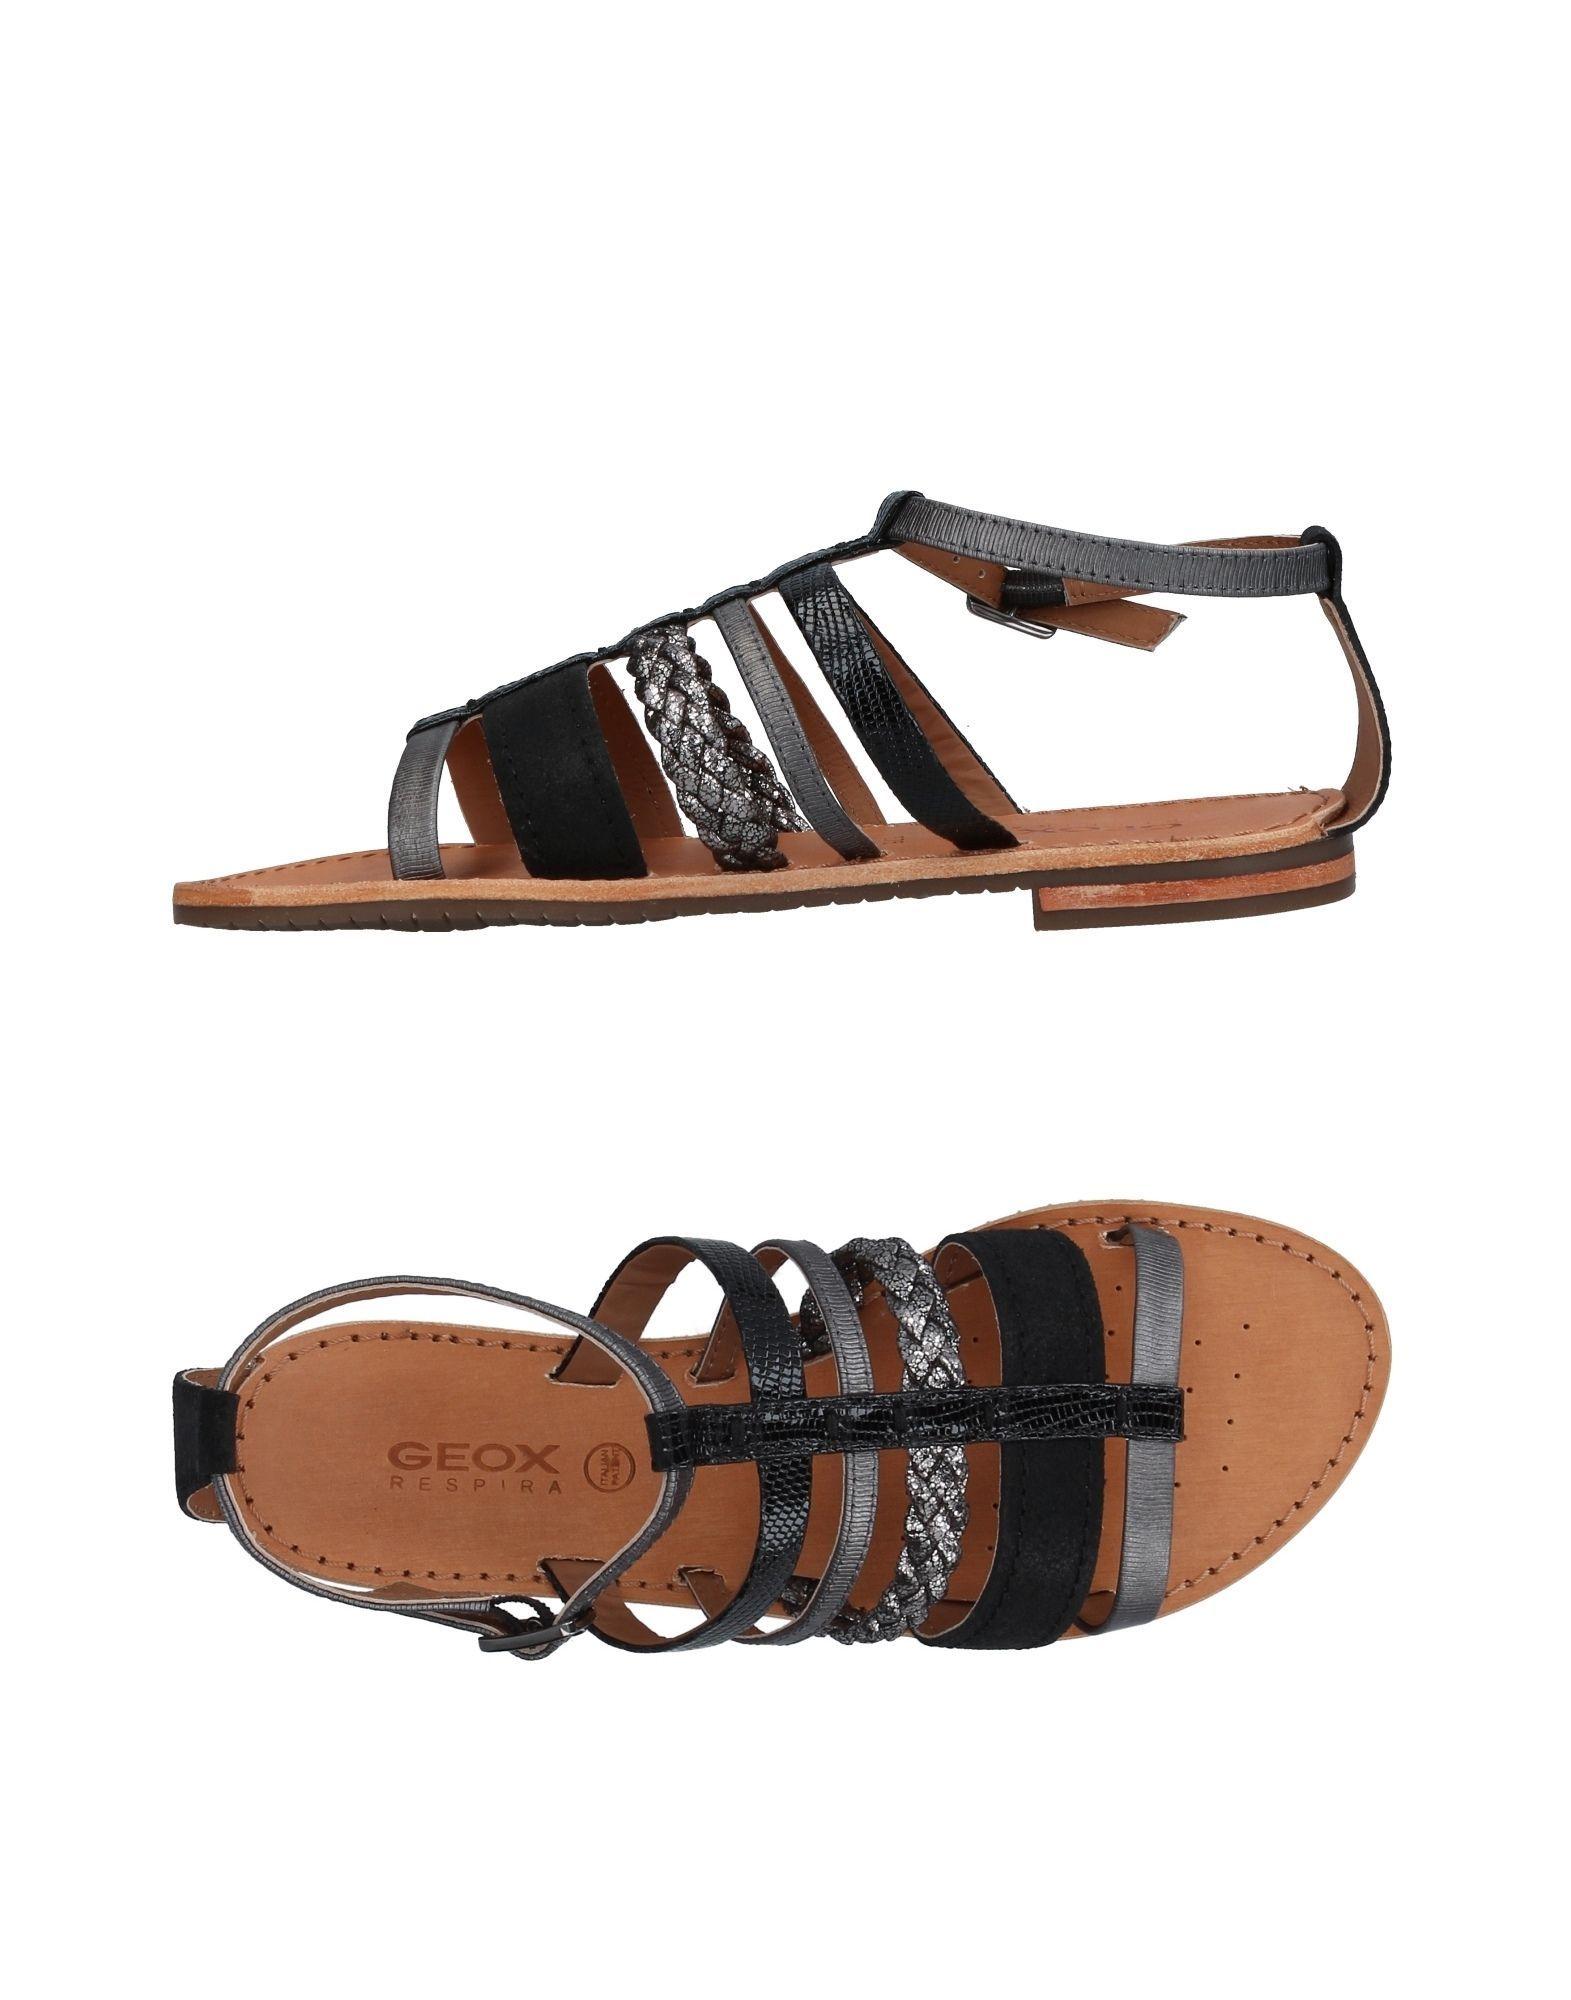 GEOX . #geox #shoes # BdSrj